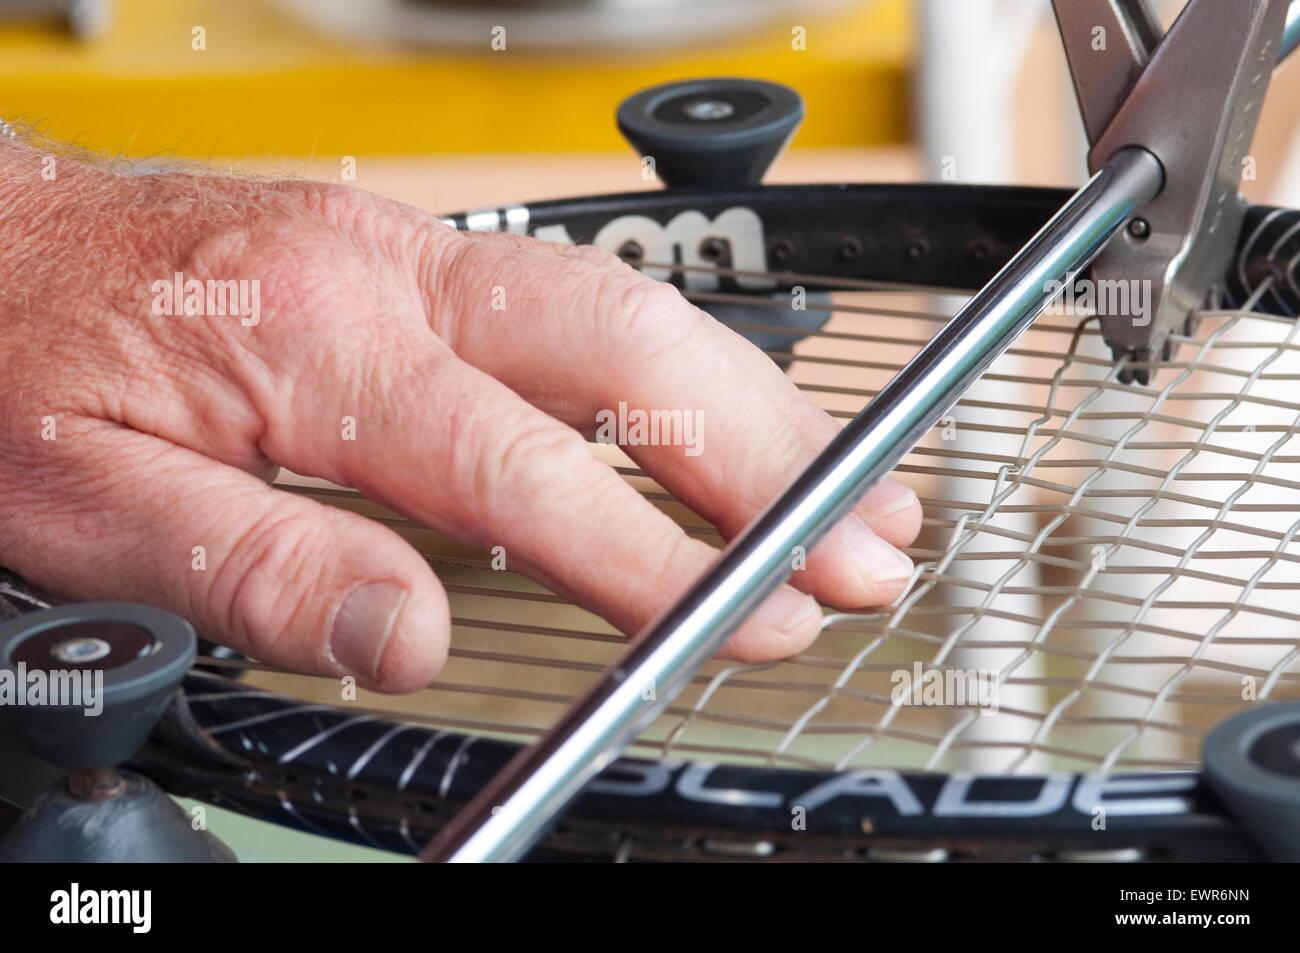 Tennis Racket in Stringing Machine Being Repaired - Stock Image